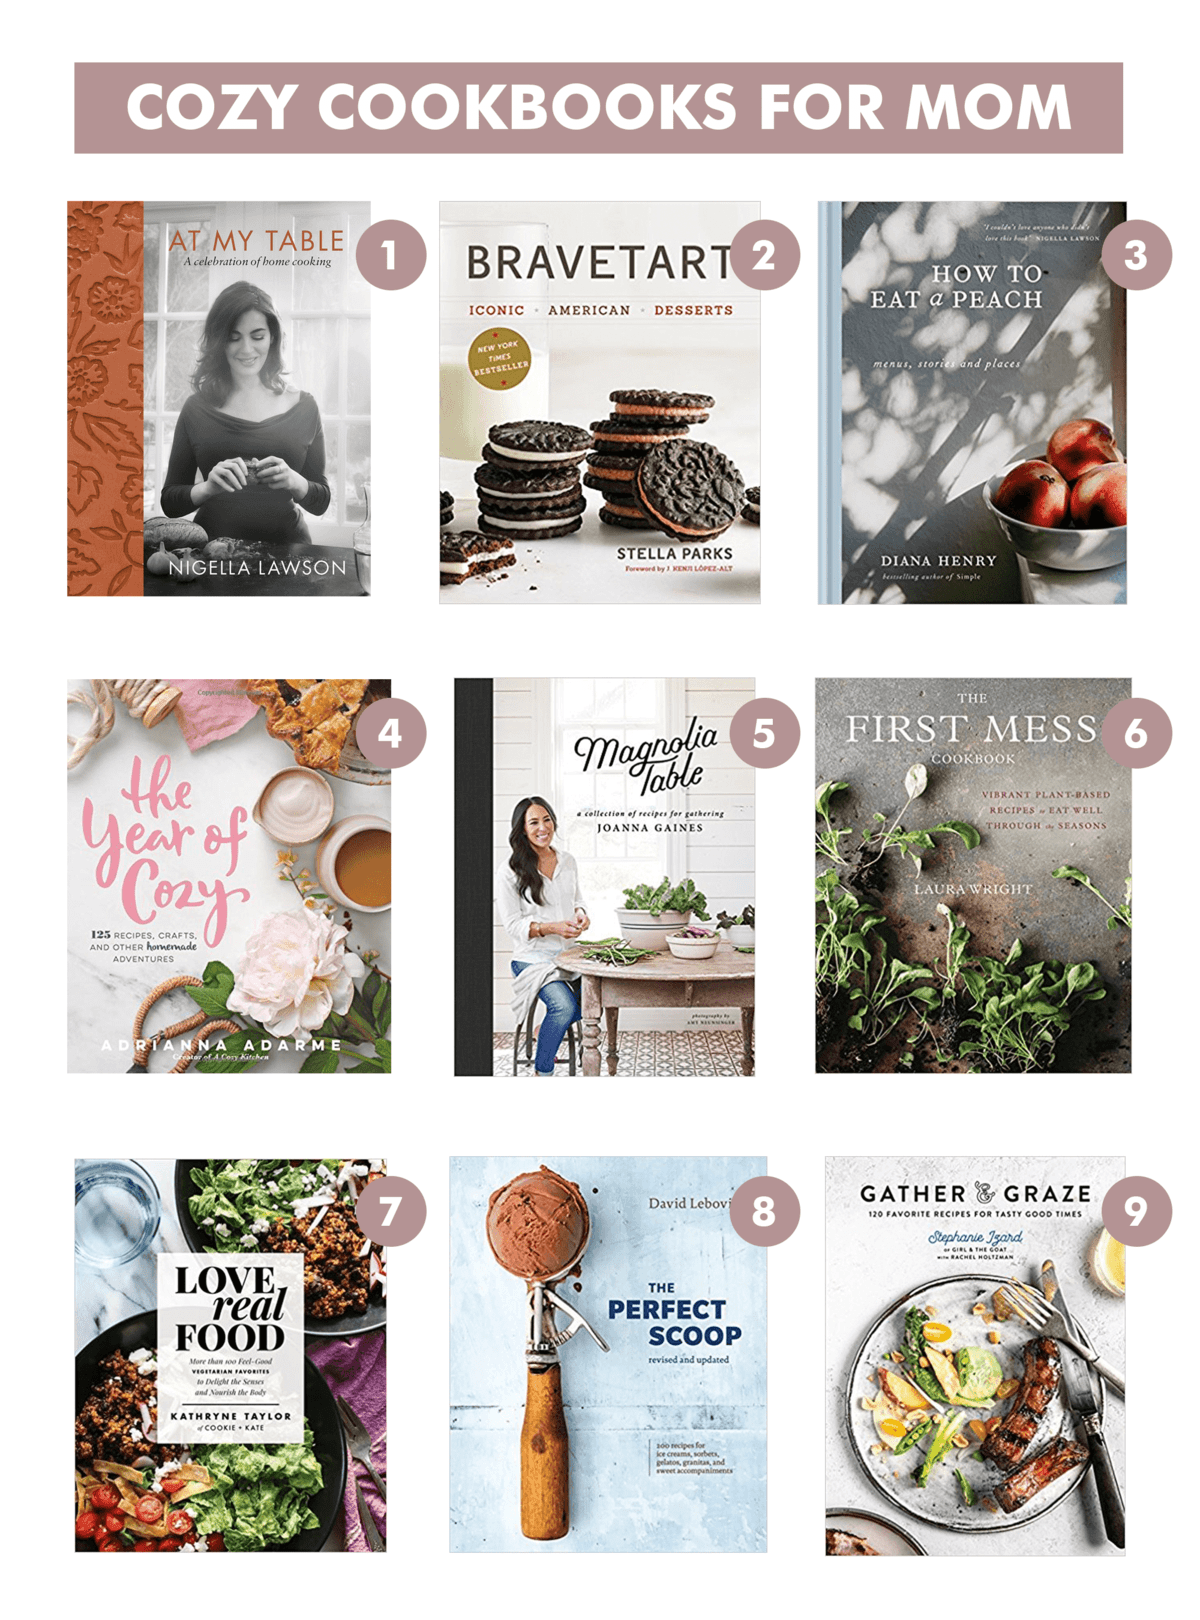 A Cozy Kitchen - Recipe blog by Adrianna Adarme - Page 3